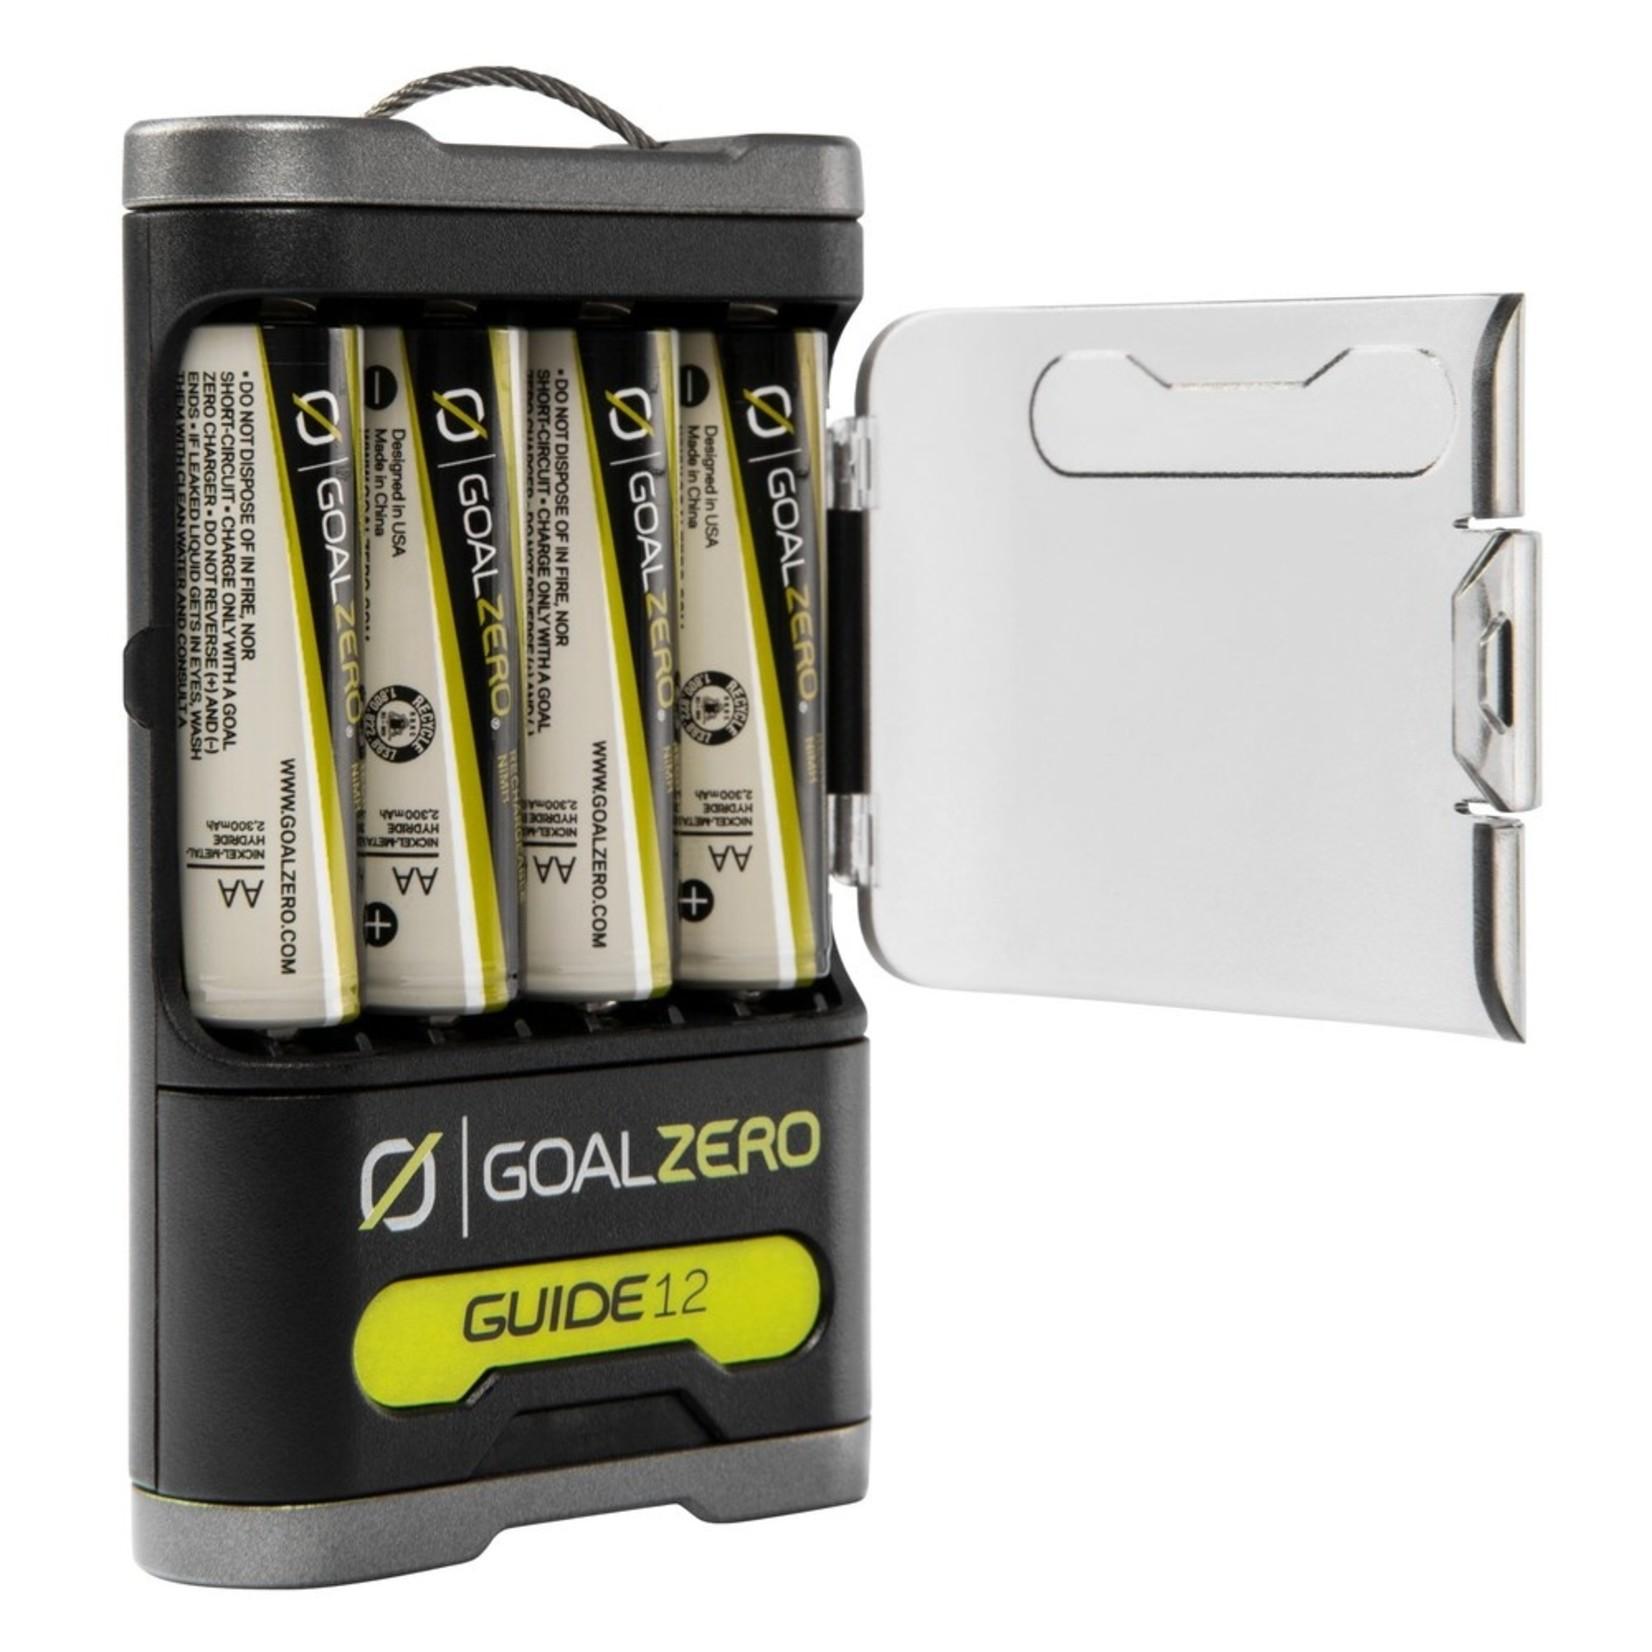 GOALZERO GOAL ZERO Guide 12 + Nomad 5 Kit